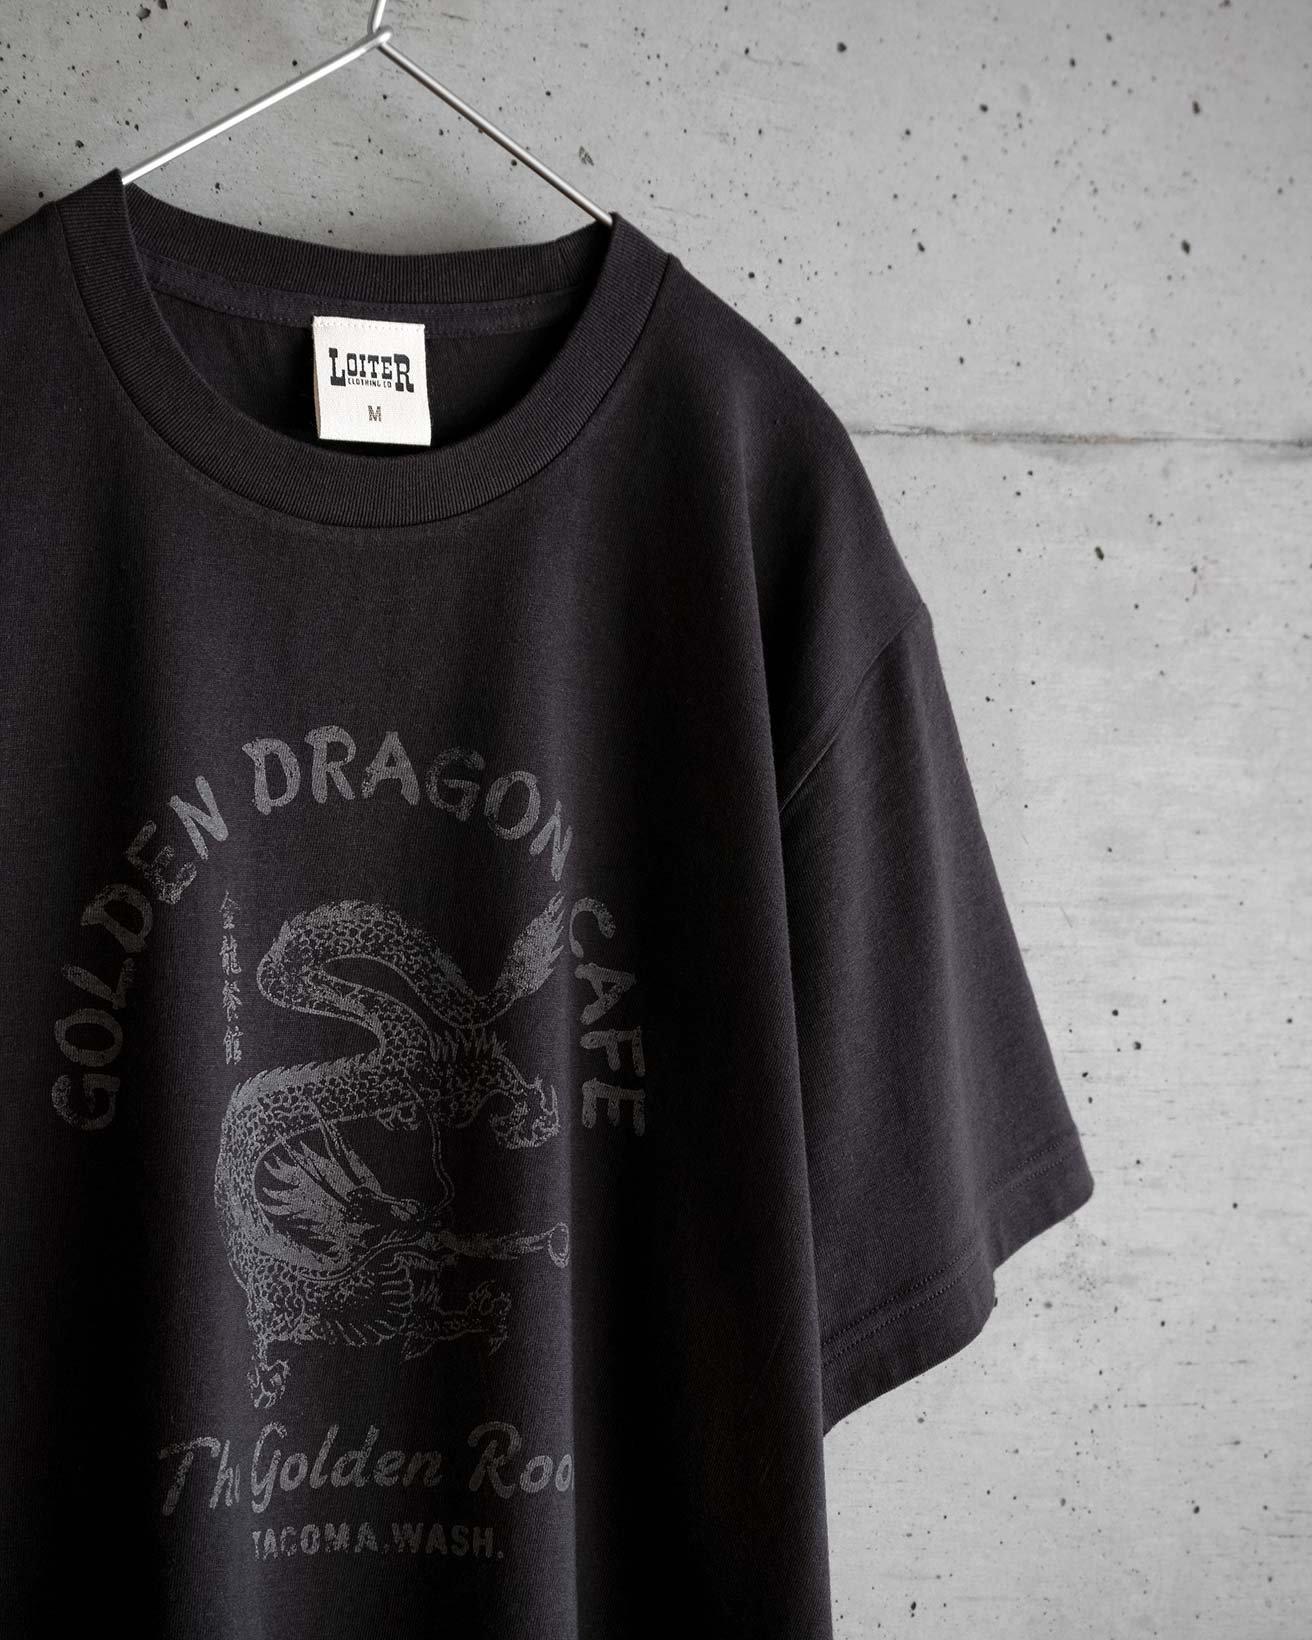 GOLDEN DRAGON CAFE Tシャツ